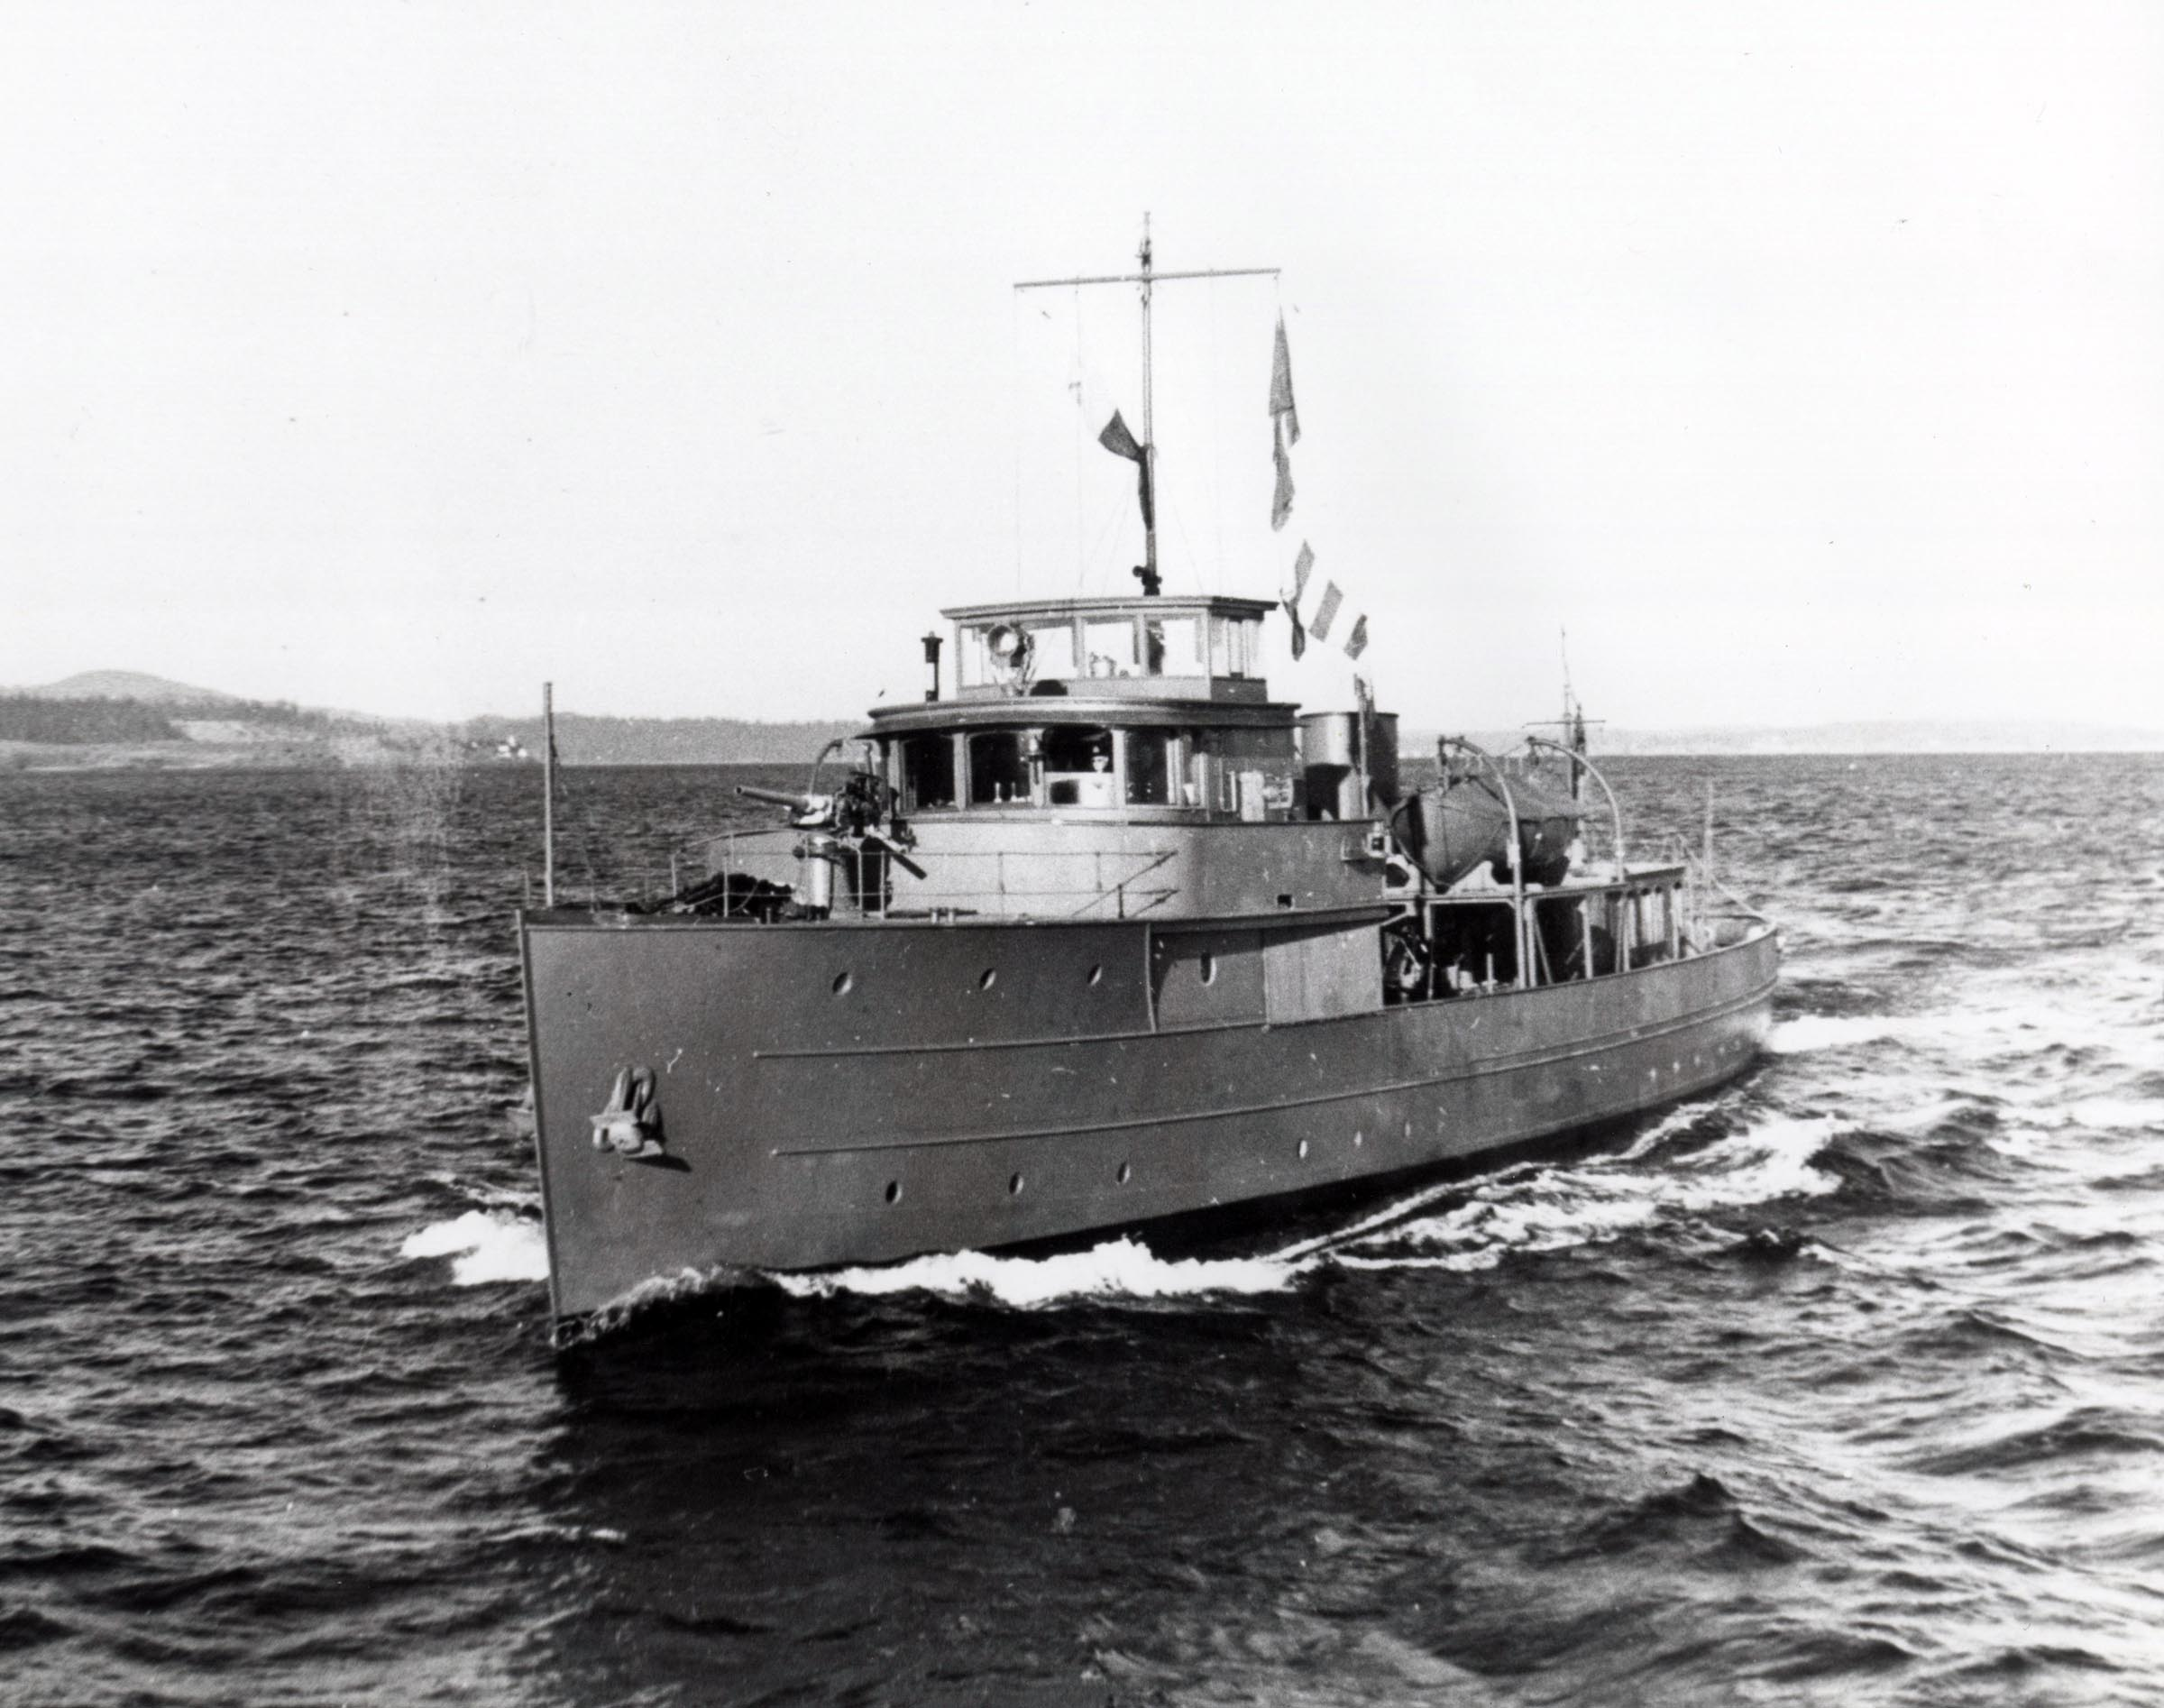 HMCS COUGAR